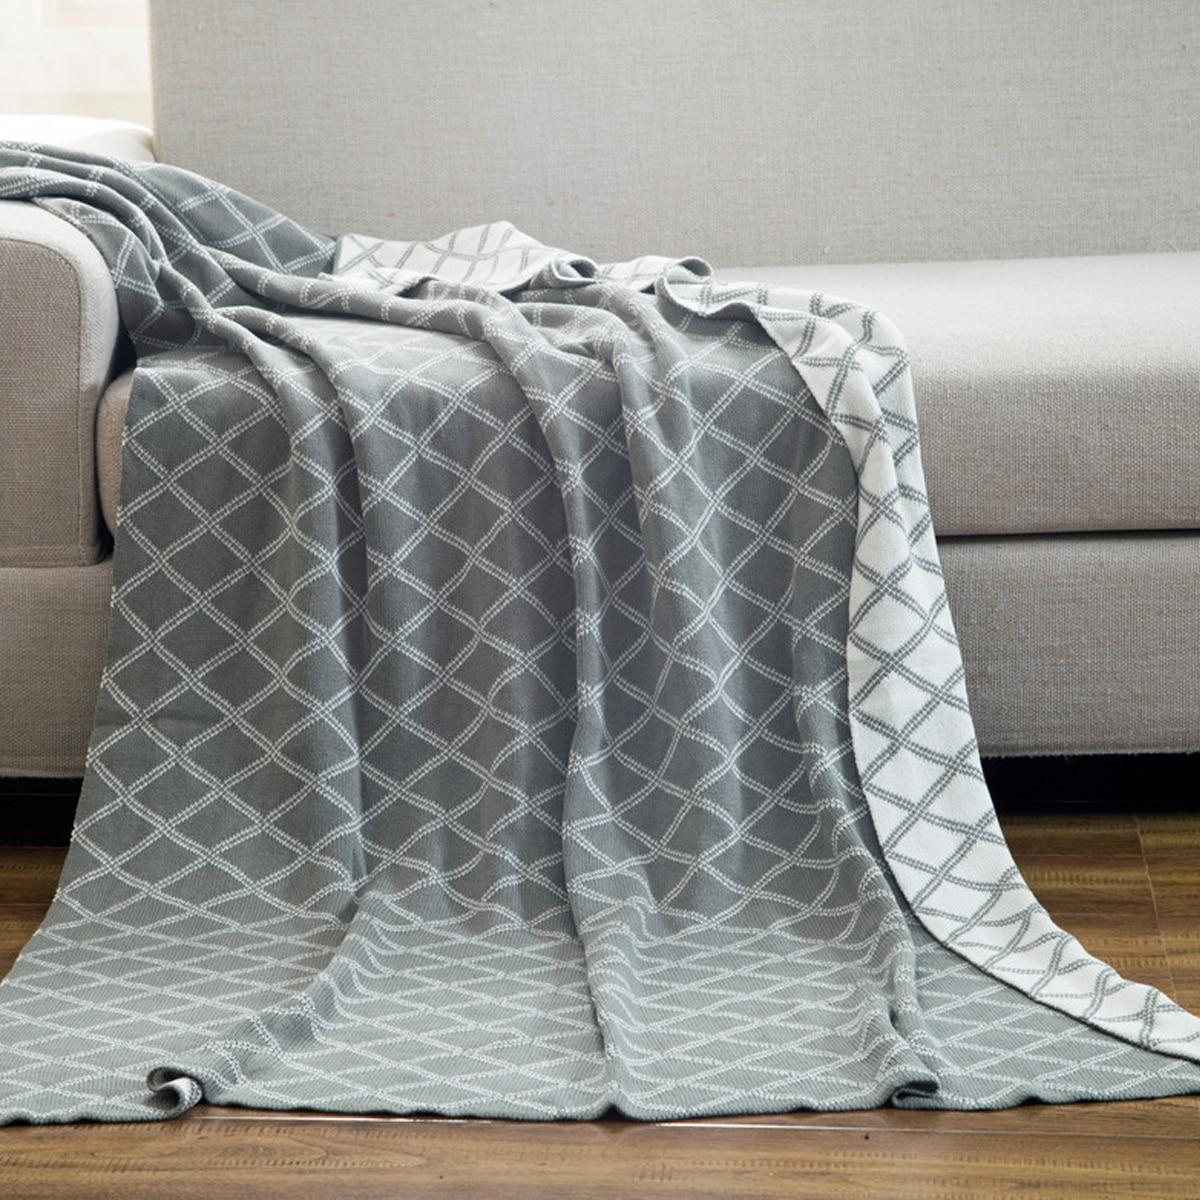 Вязаное одеяло с геометрическим узором 1шт фото